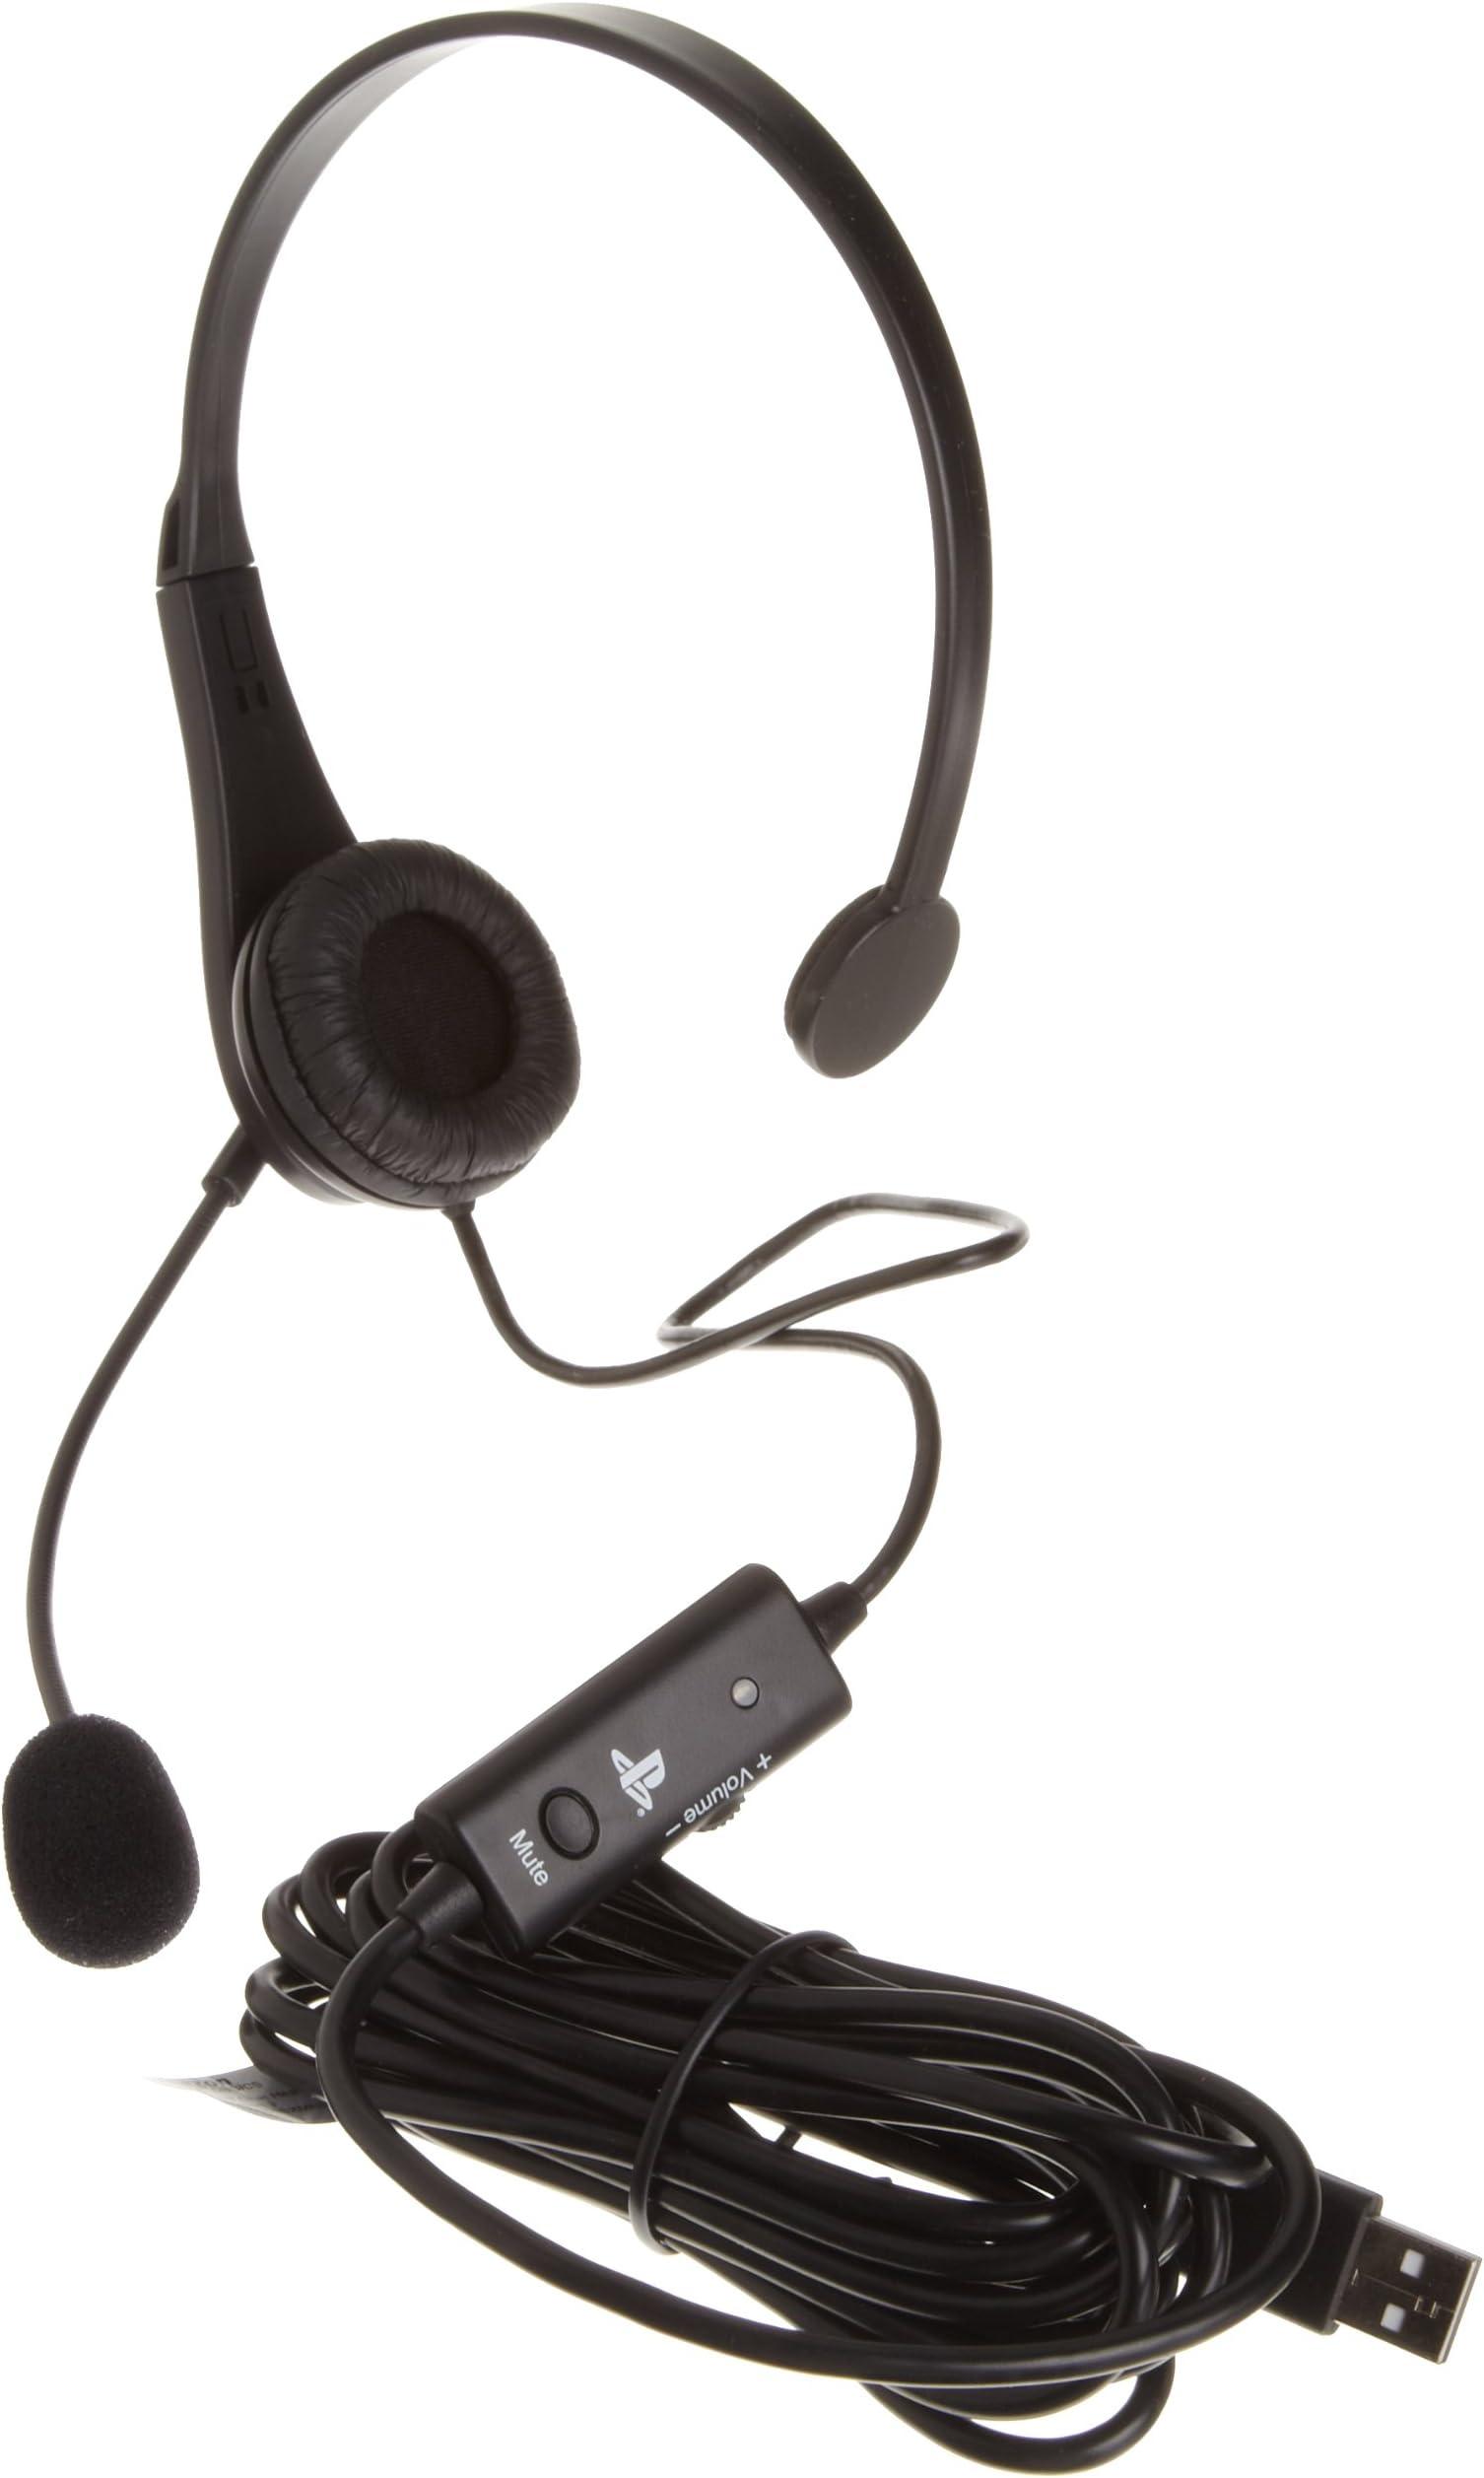 Amazon.com: AmazonBasics PlayStation 3 Wired USB Chat Headset ...